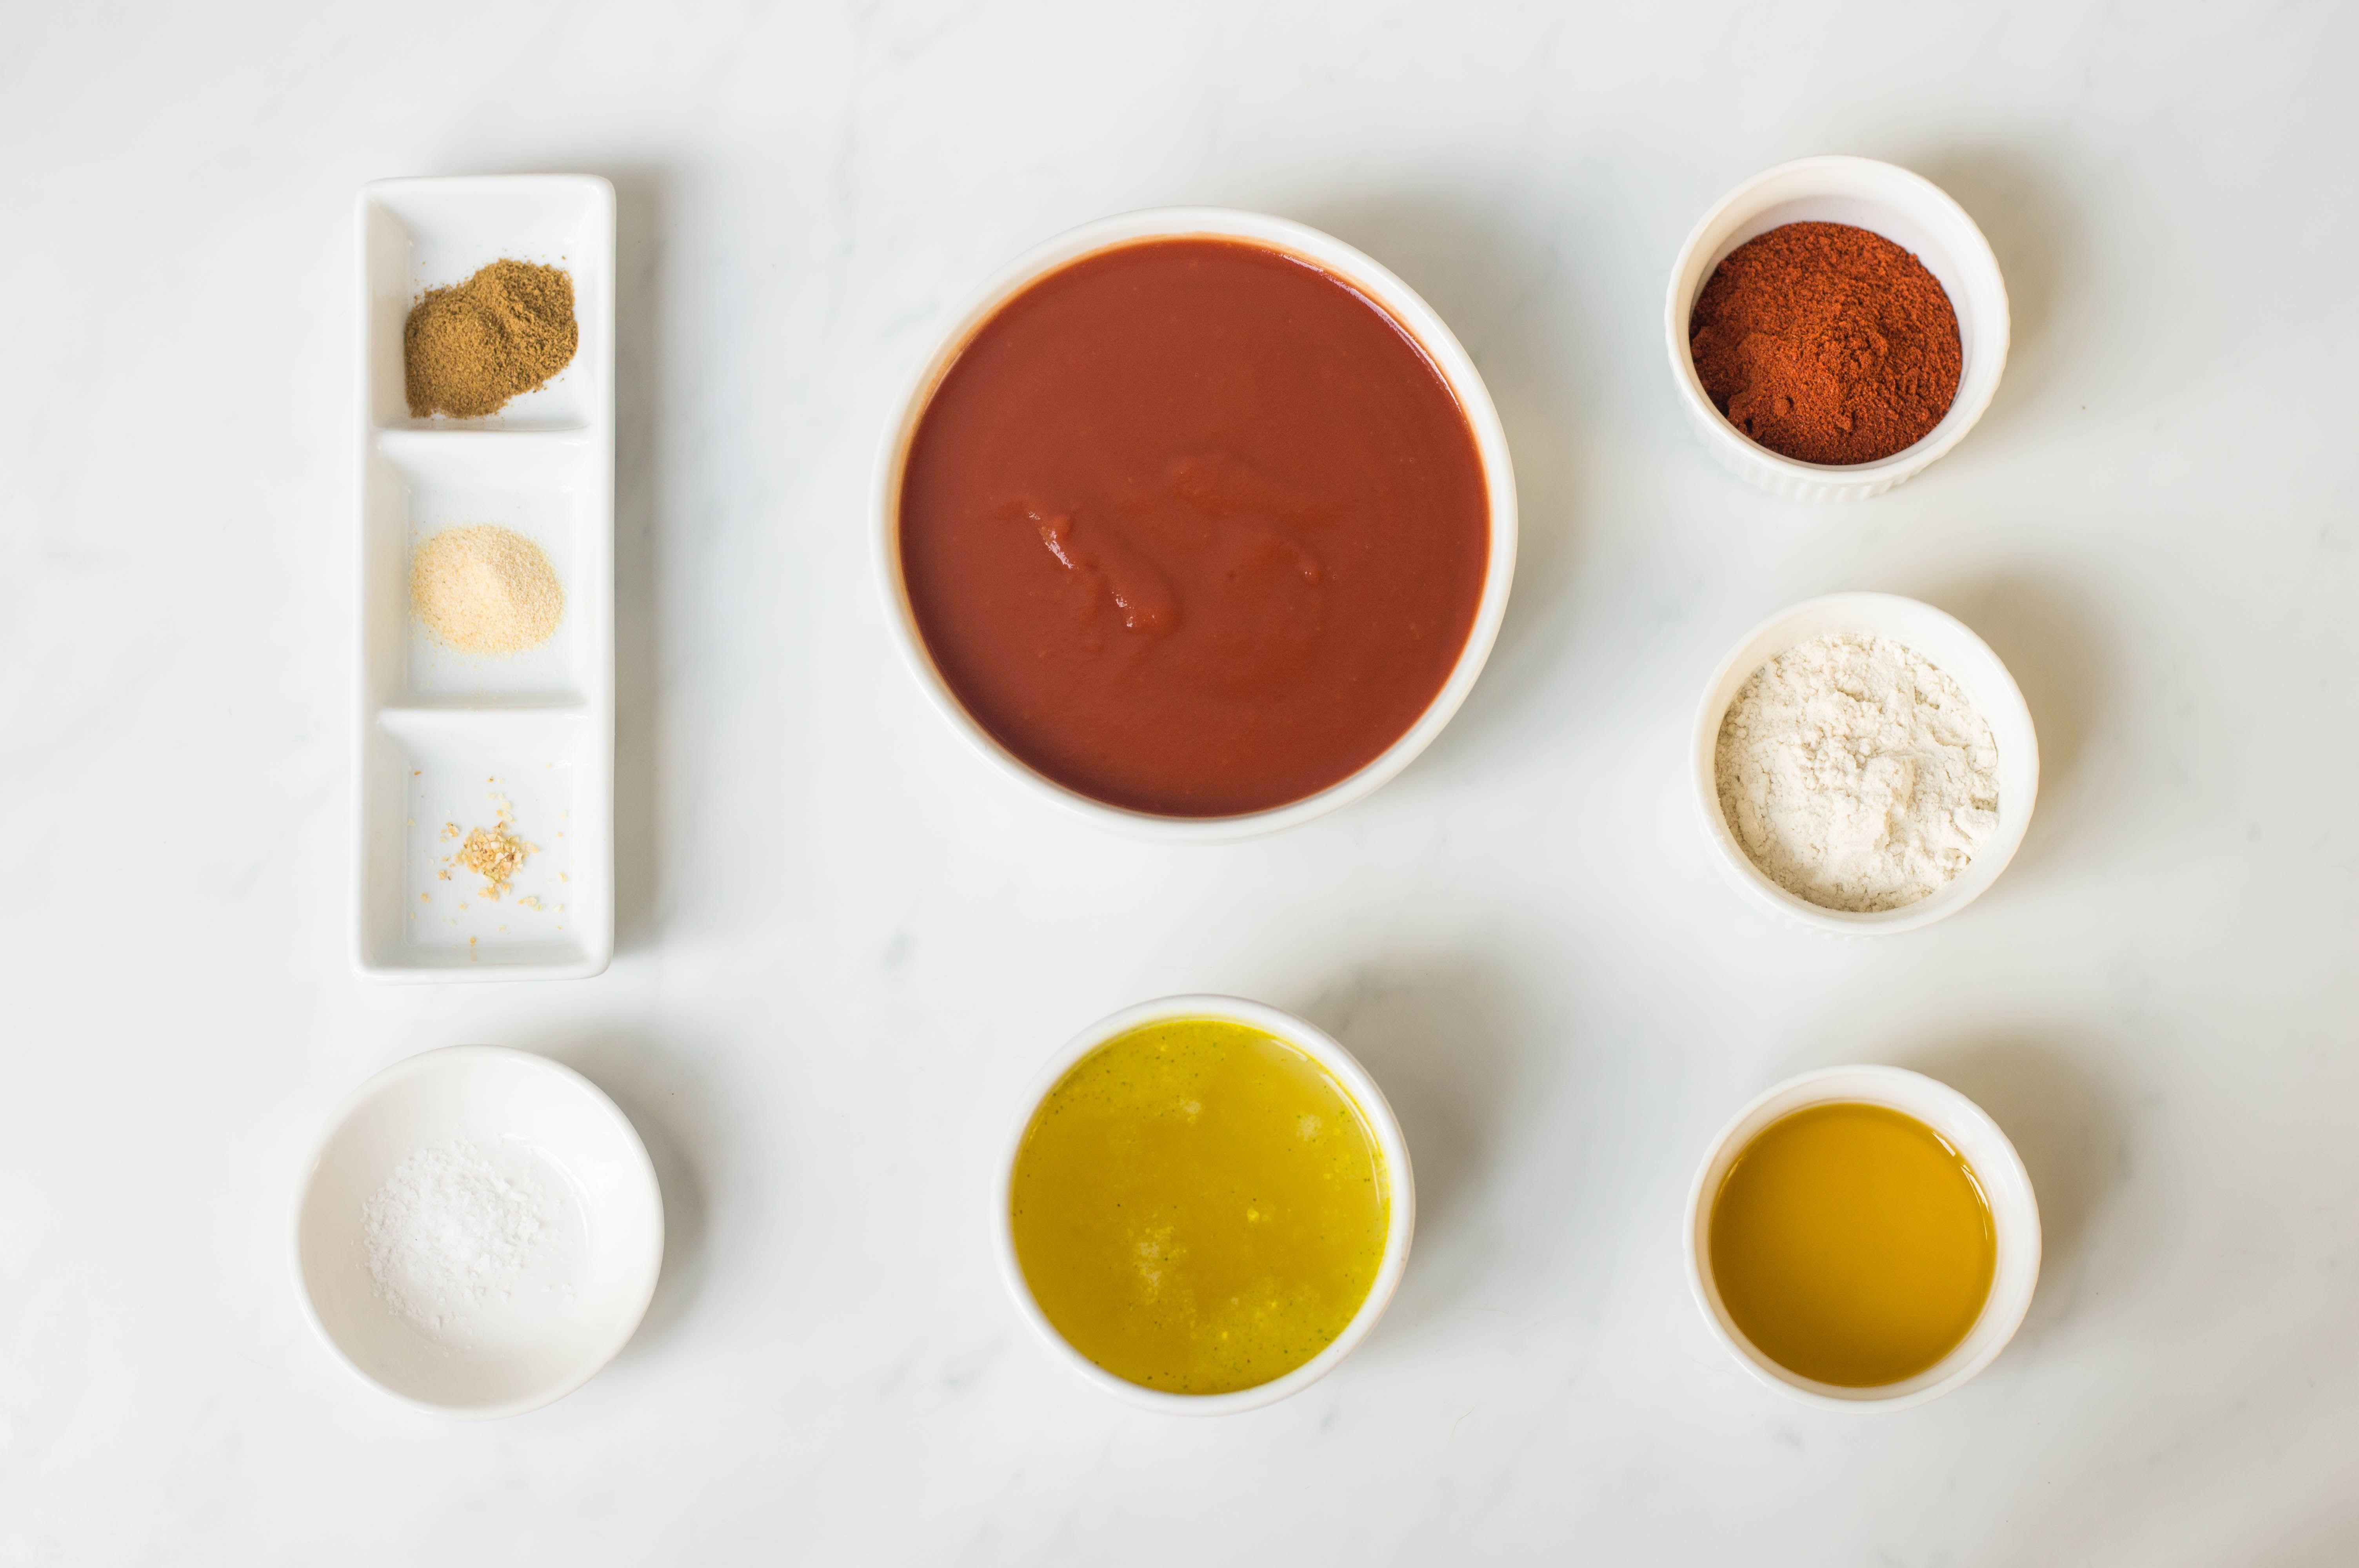 Quick enchilada sauce ingredients